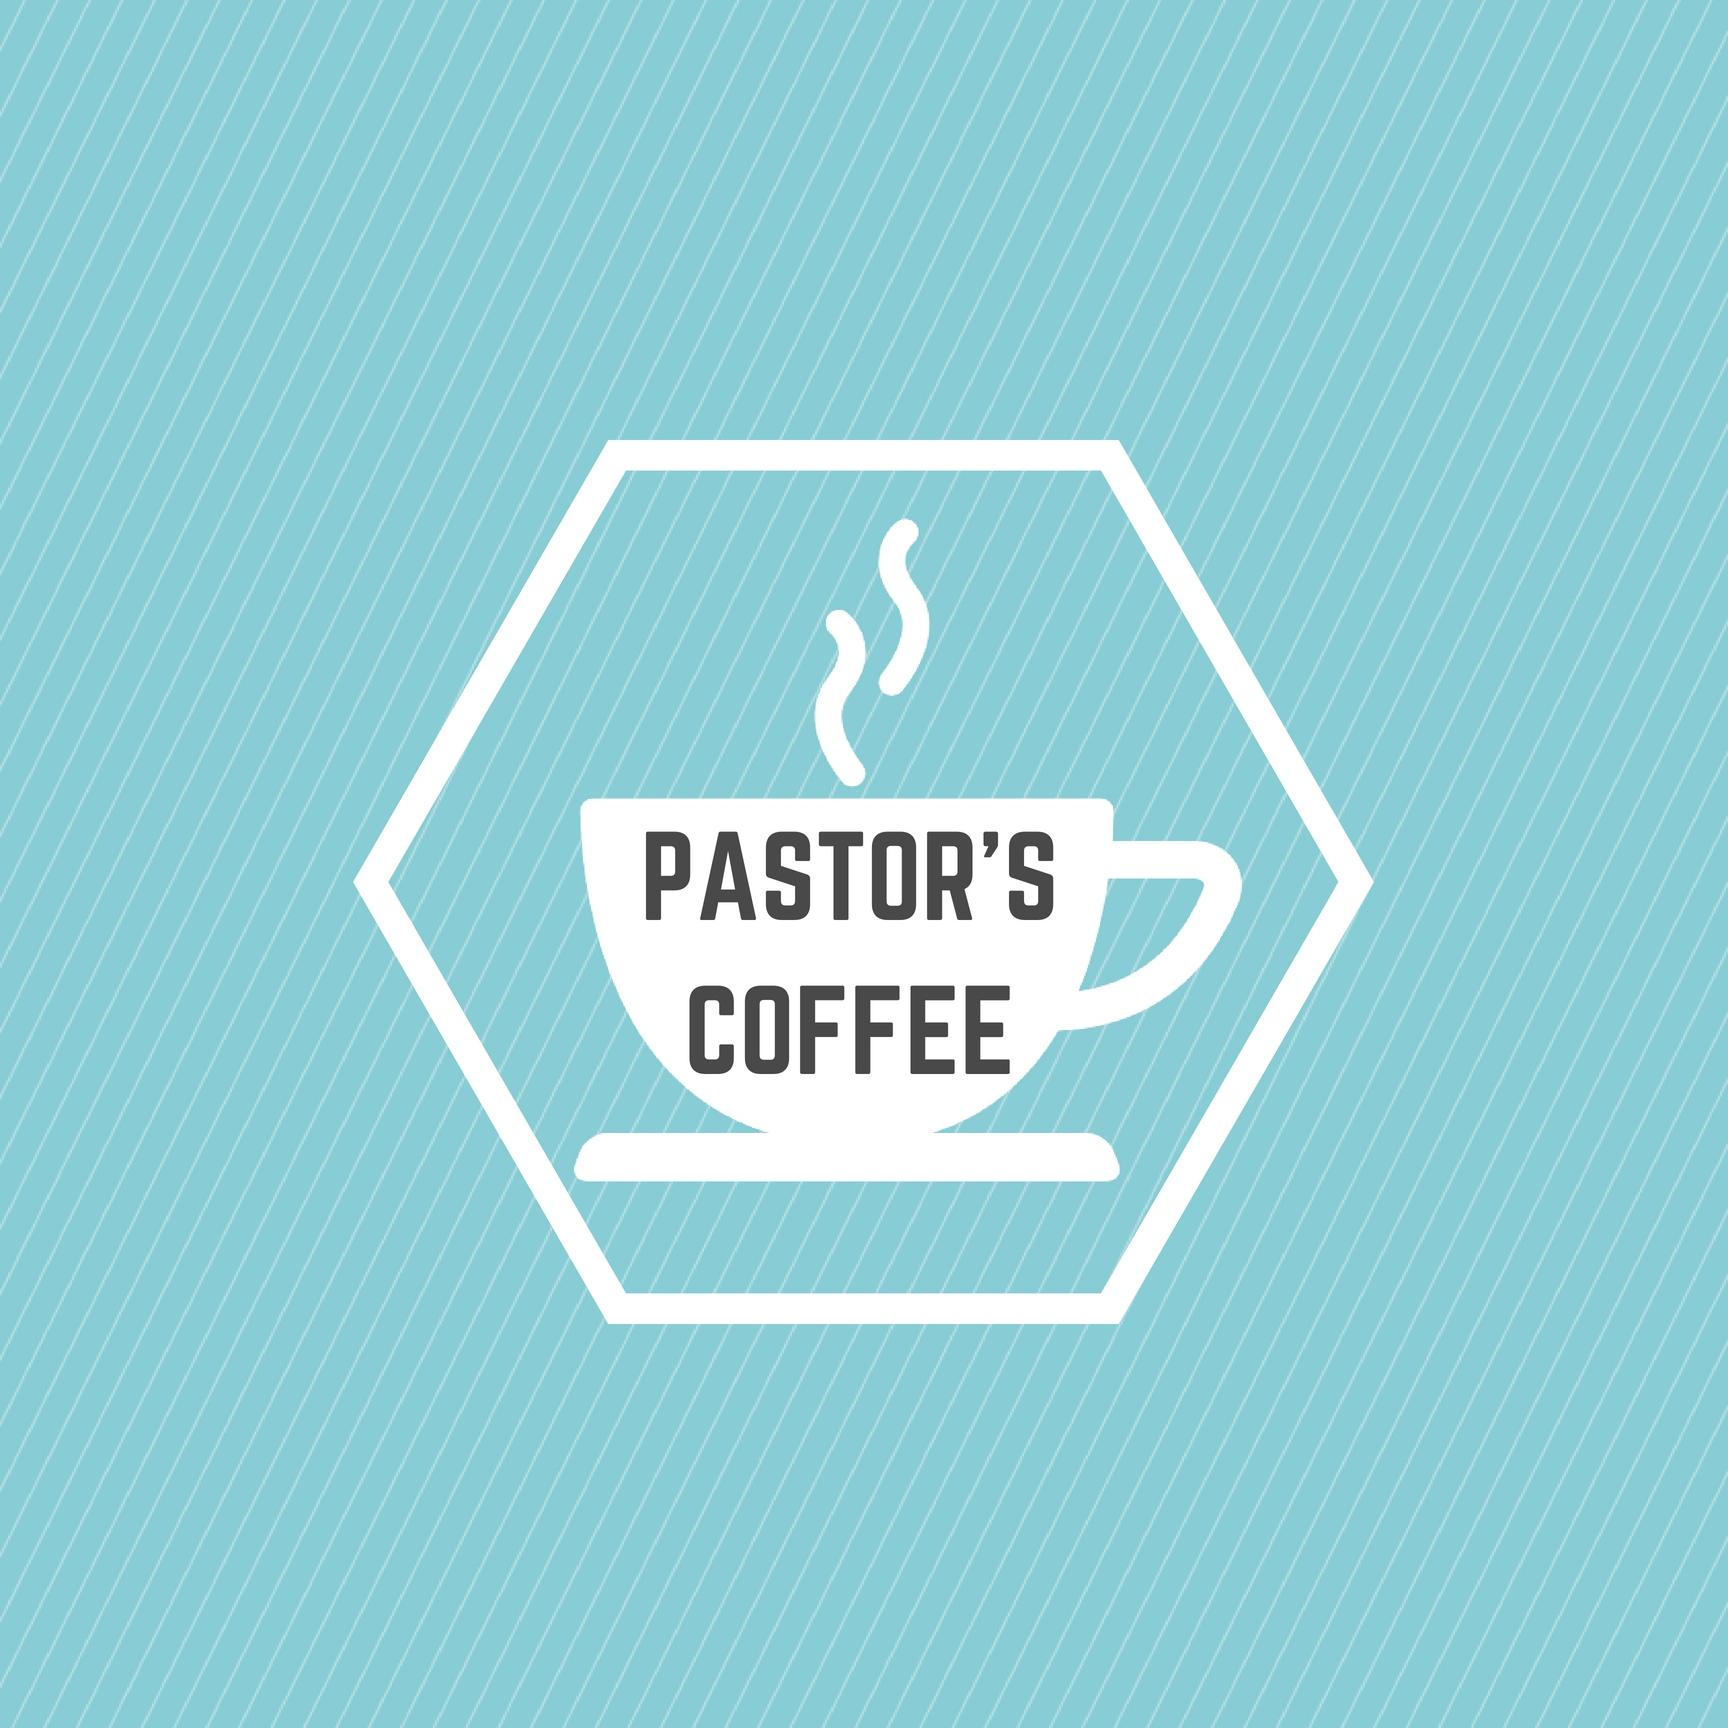 Copy of Pastor's Coffee Poster.jpg